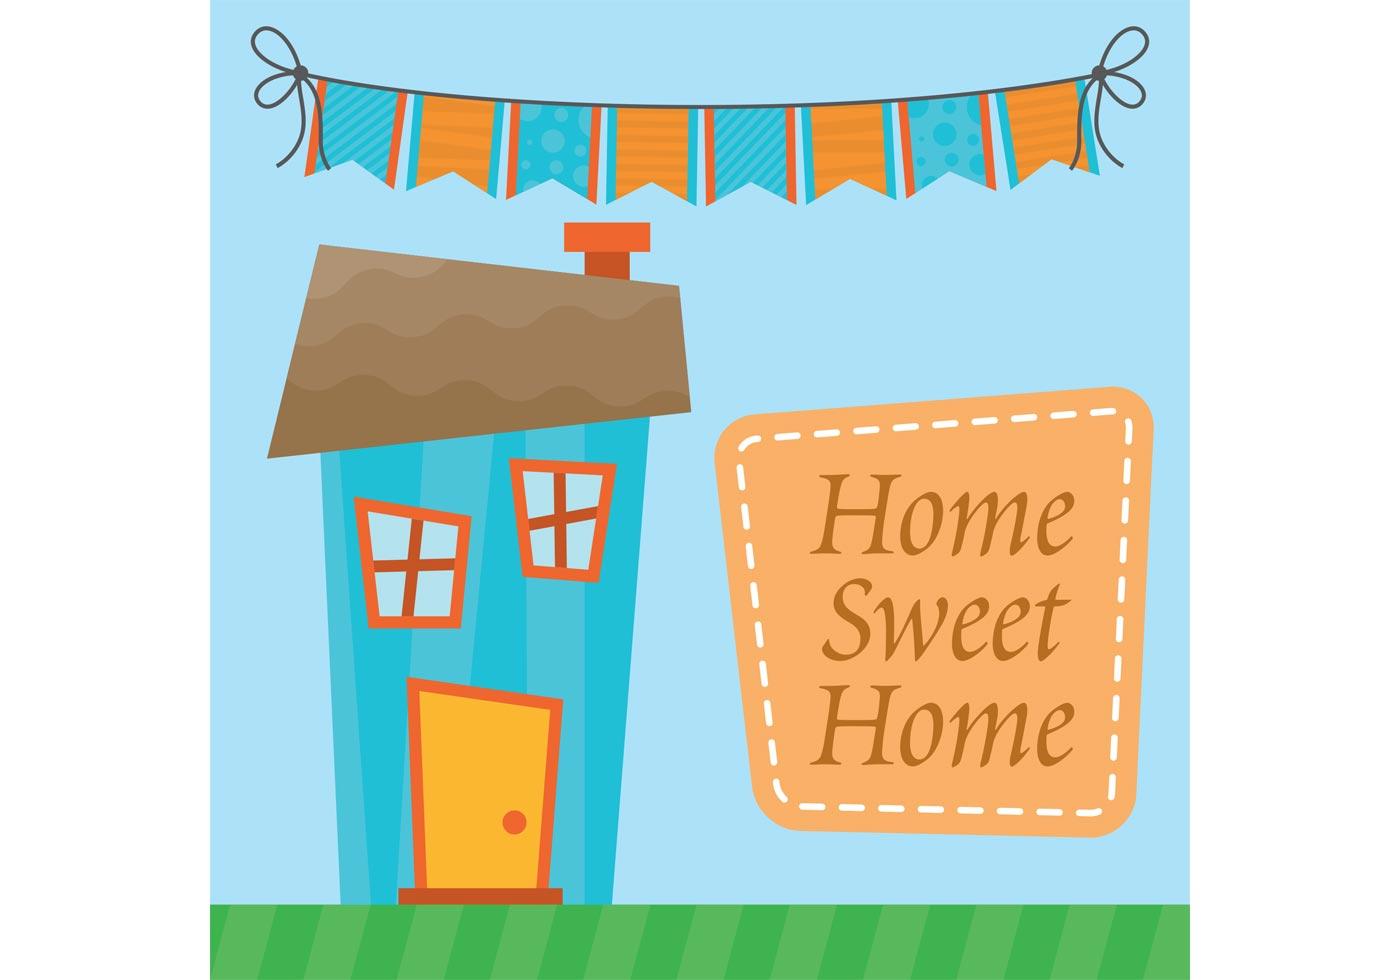 Home Sweet Home Vector - Download Free Vector Art, Stock ...